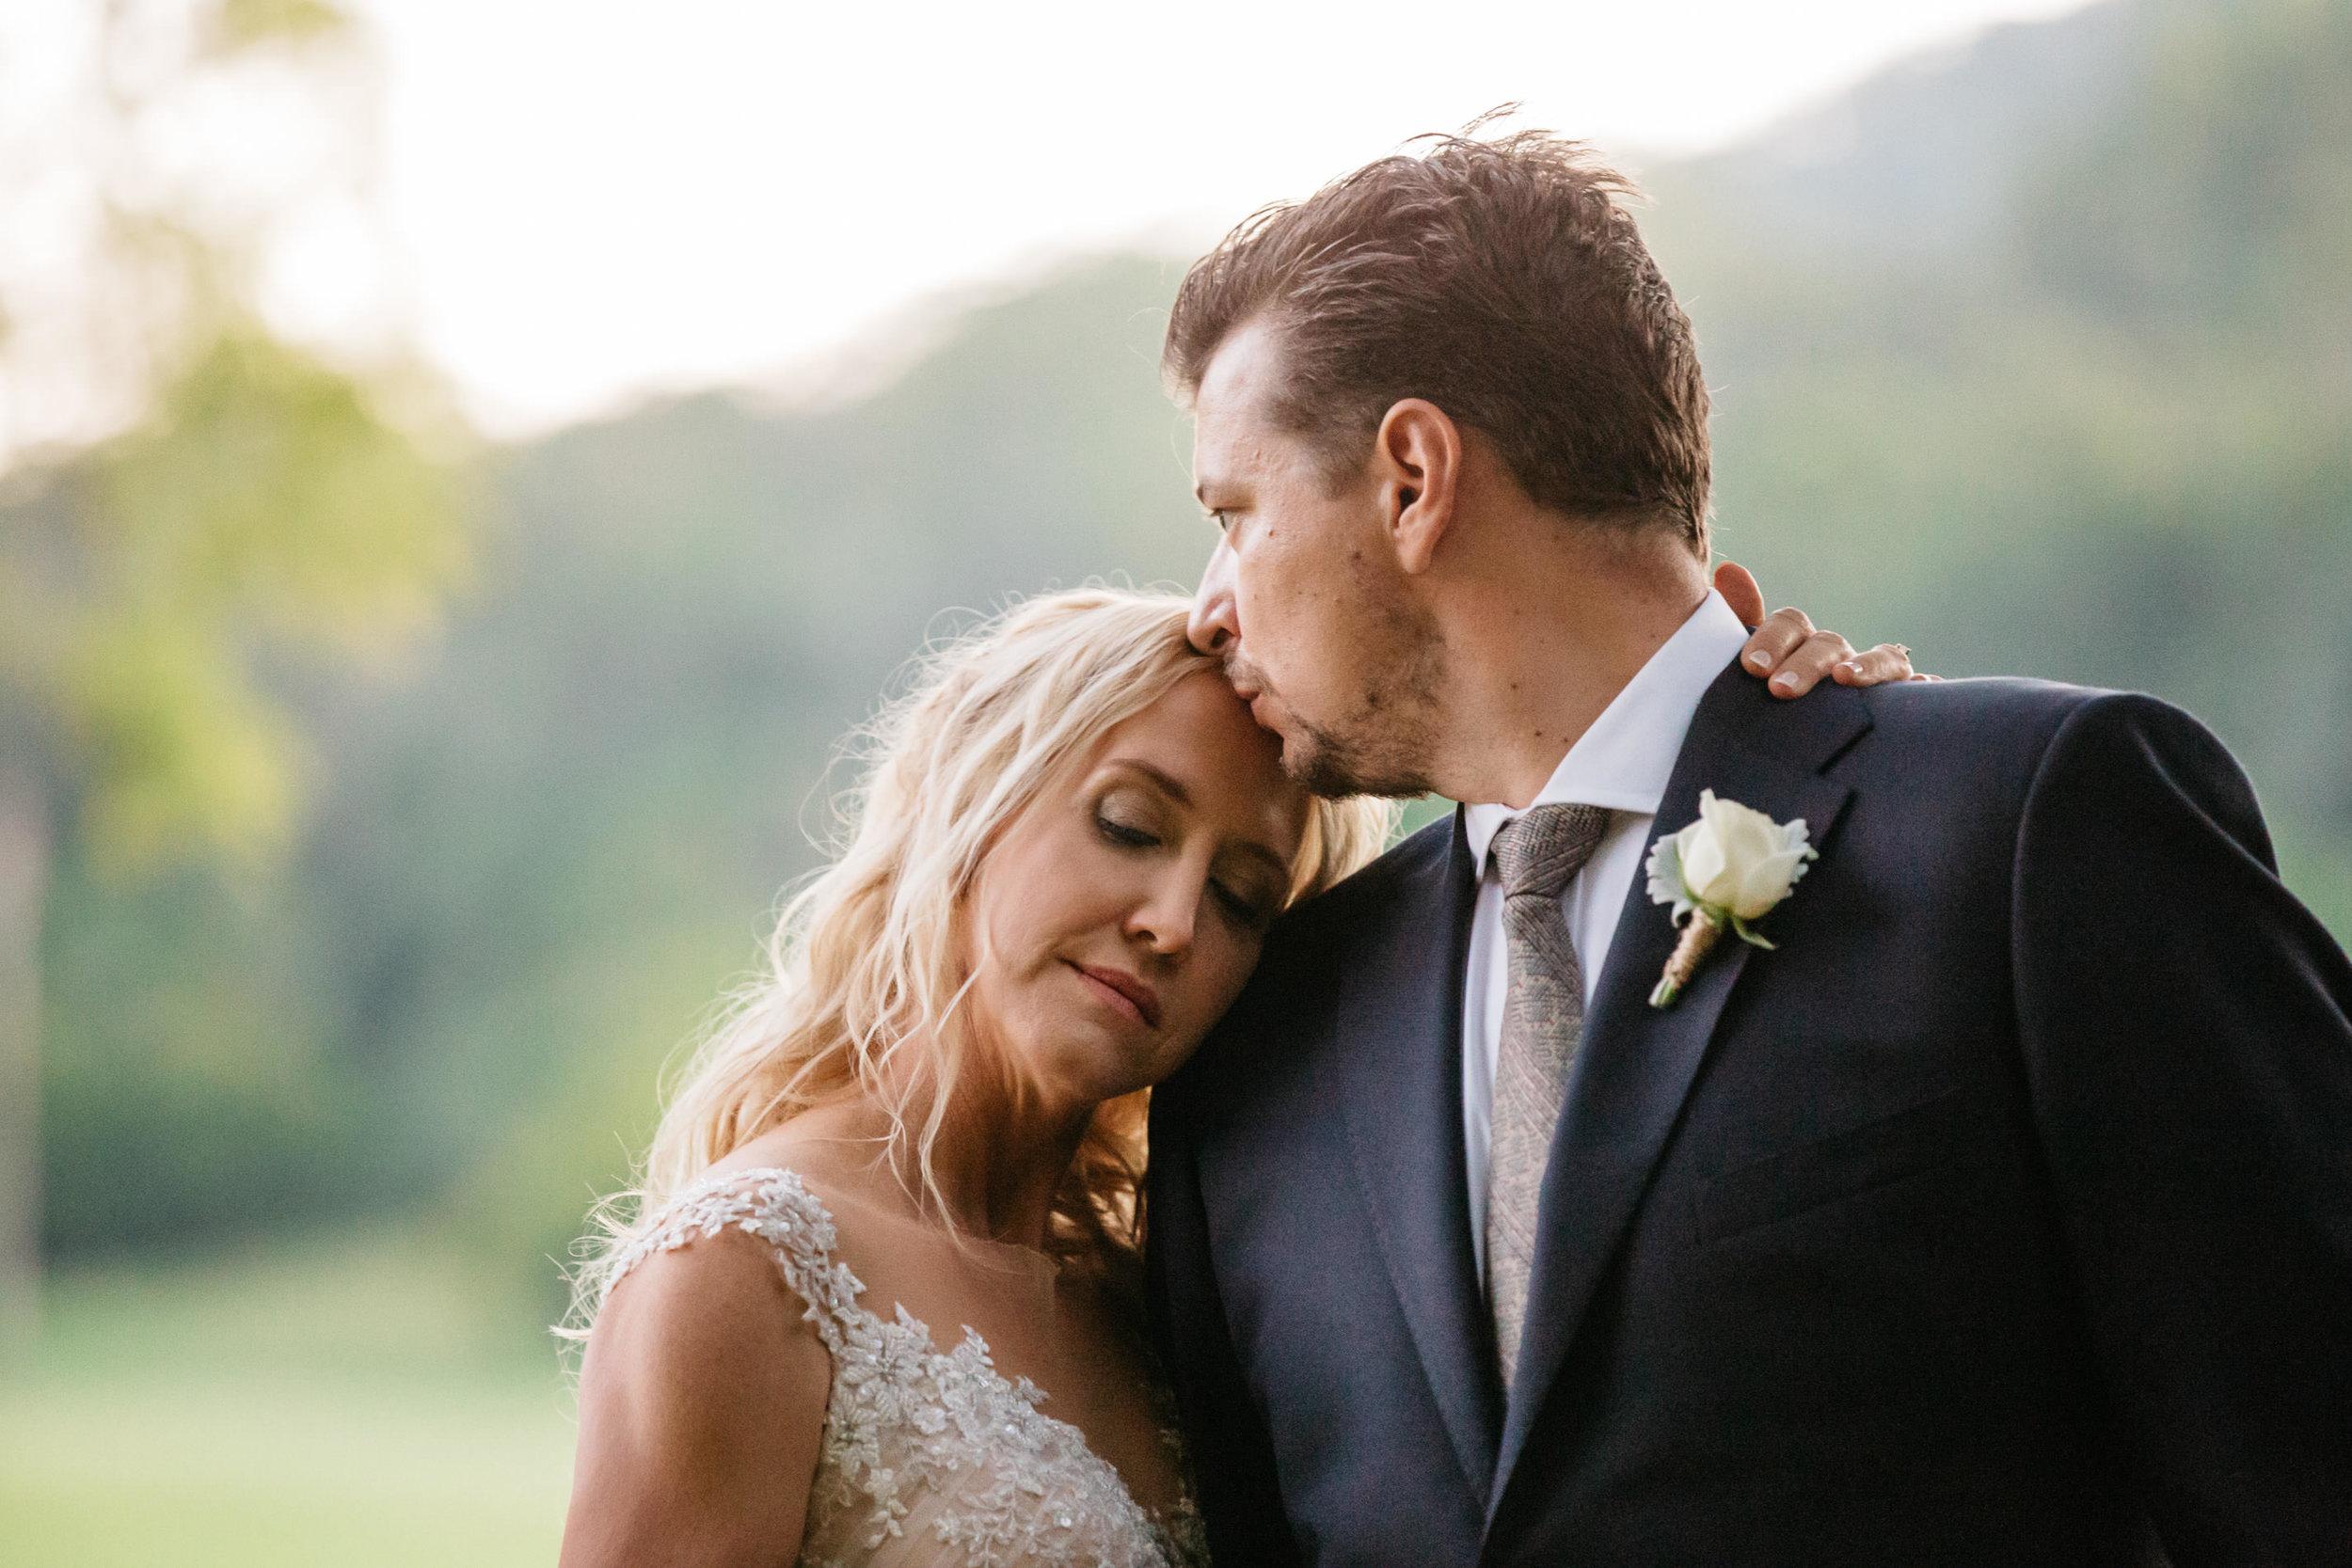 True North Photography_Boomerang Farm_Stacey and Isaac_Gold Coast Wedding_Barm Wedding_Hinterland Wedding-172.jpg